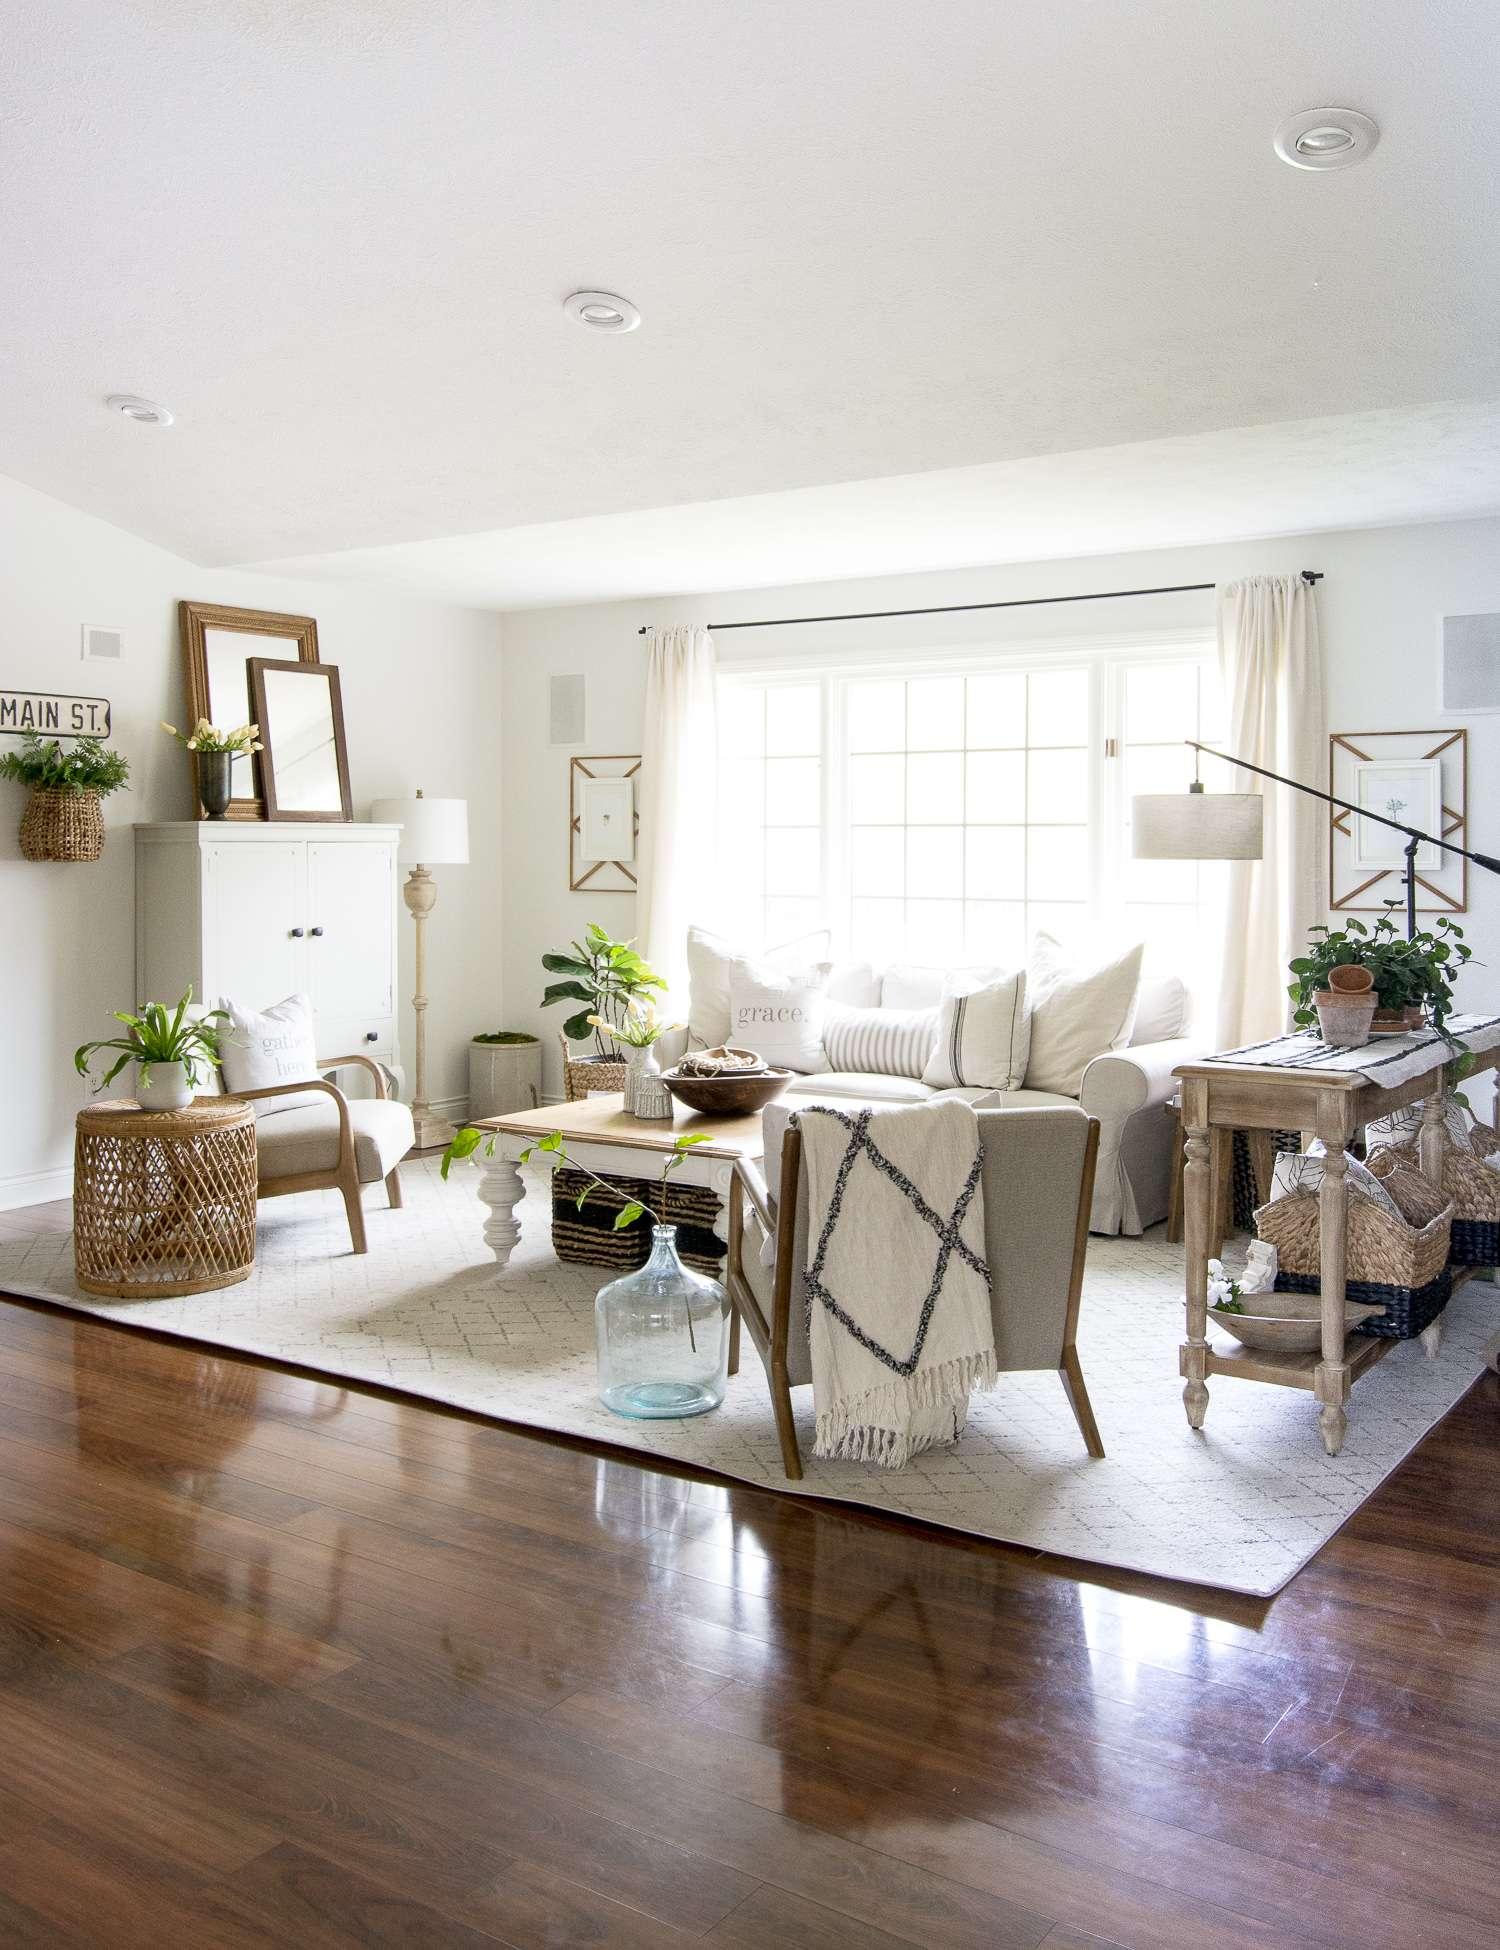 Modern farmhouse design in the living room.